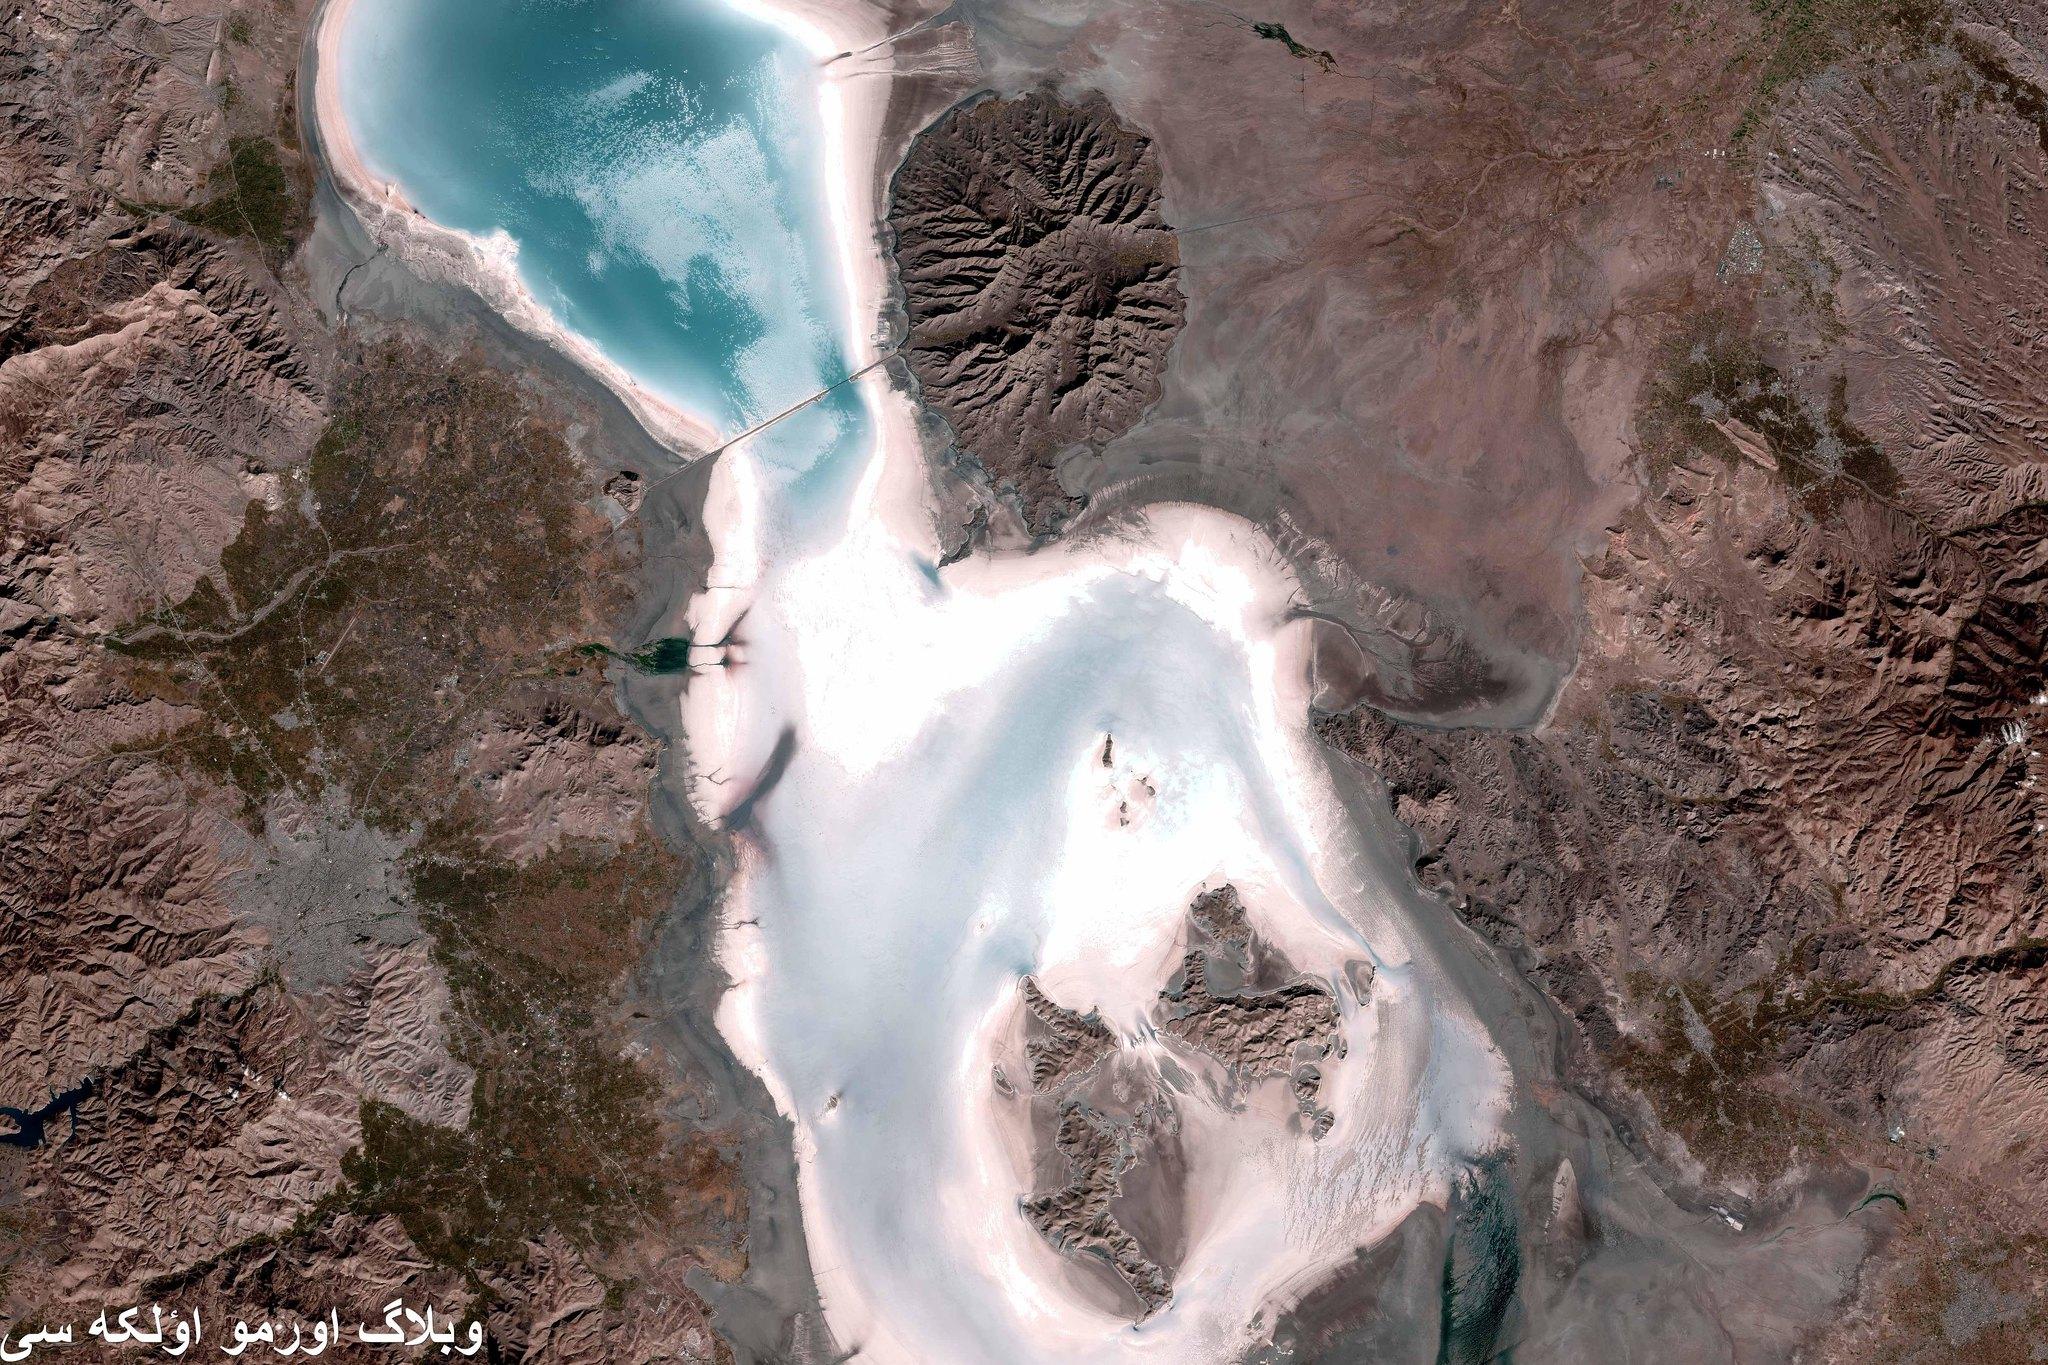 Lake Urmia - Water Challenges in Iran